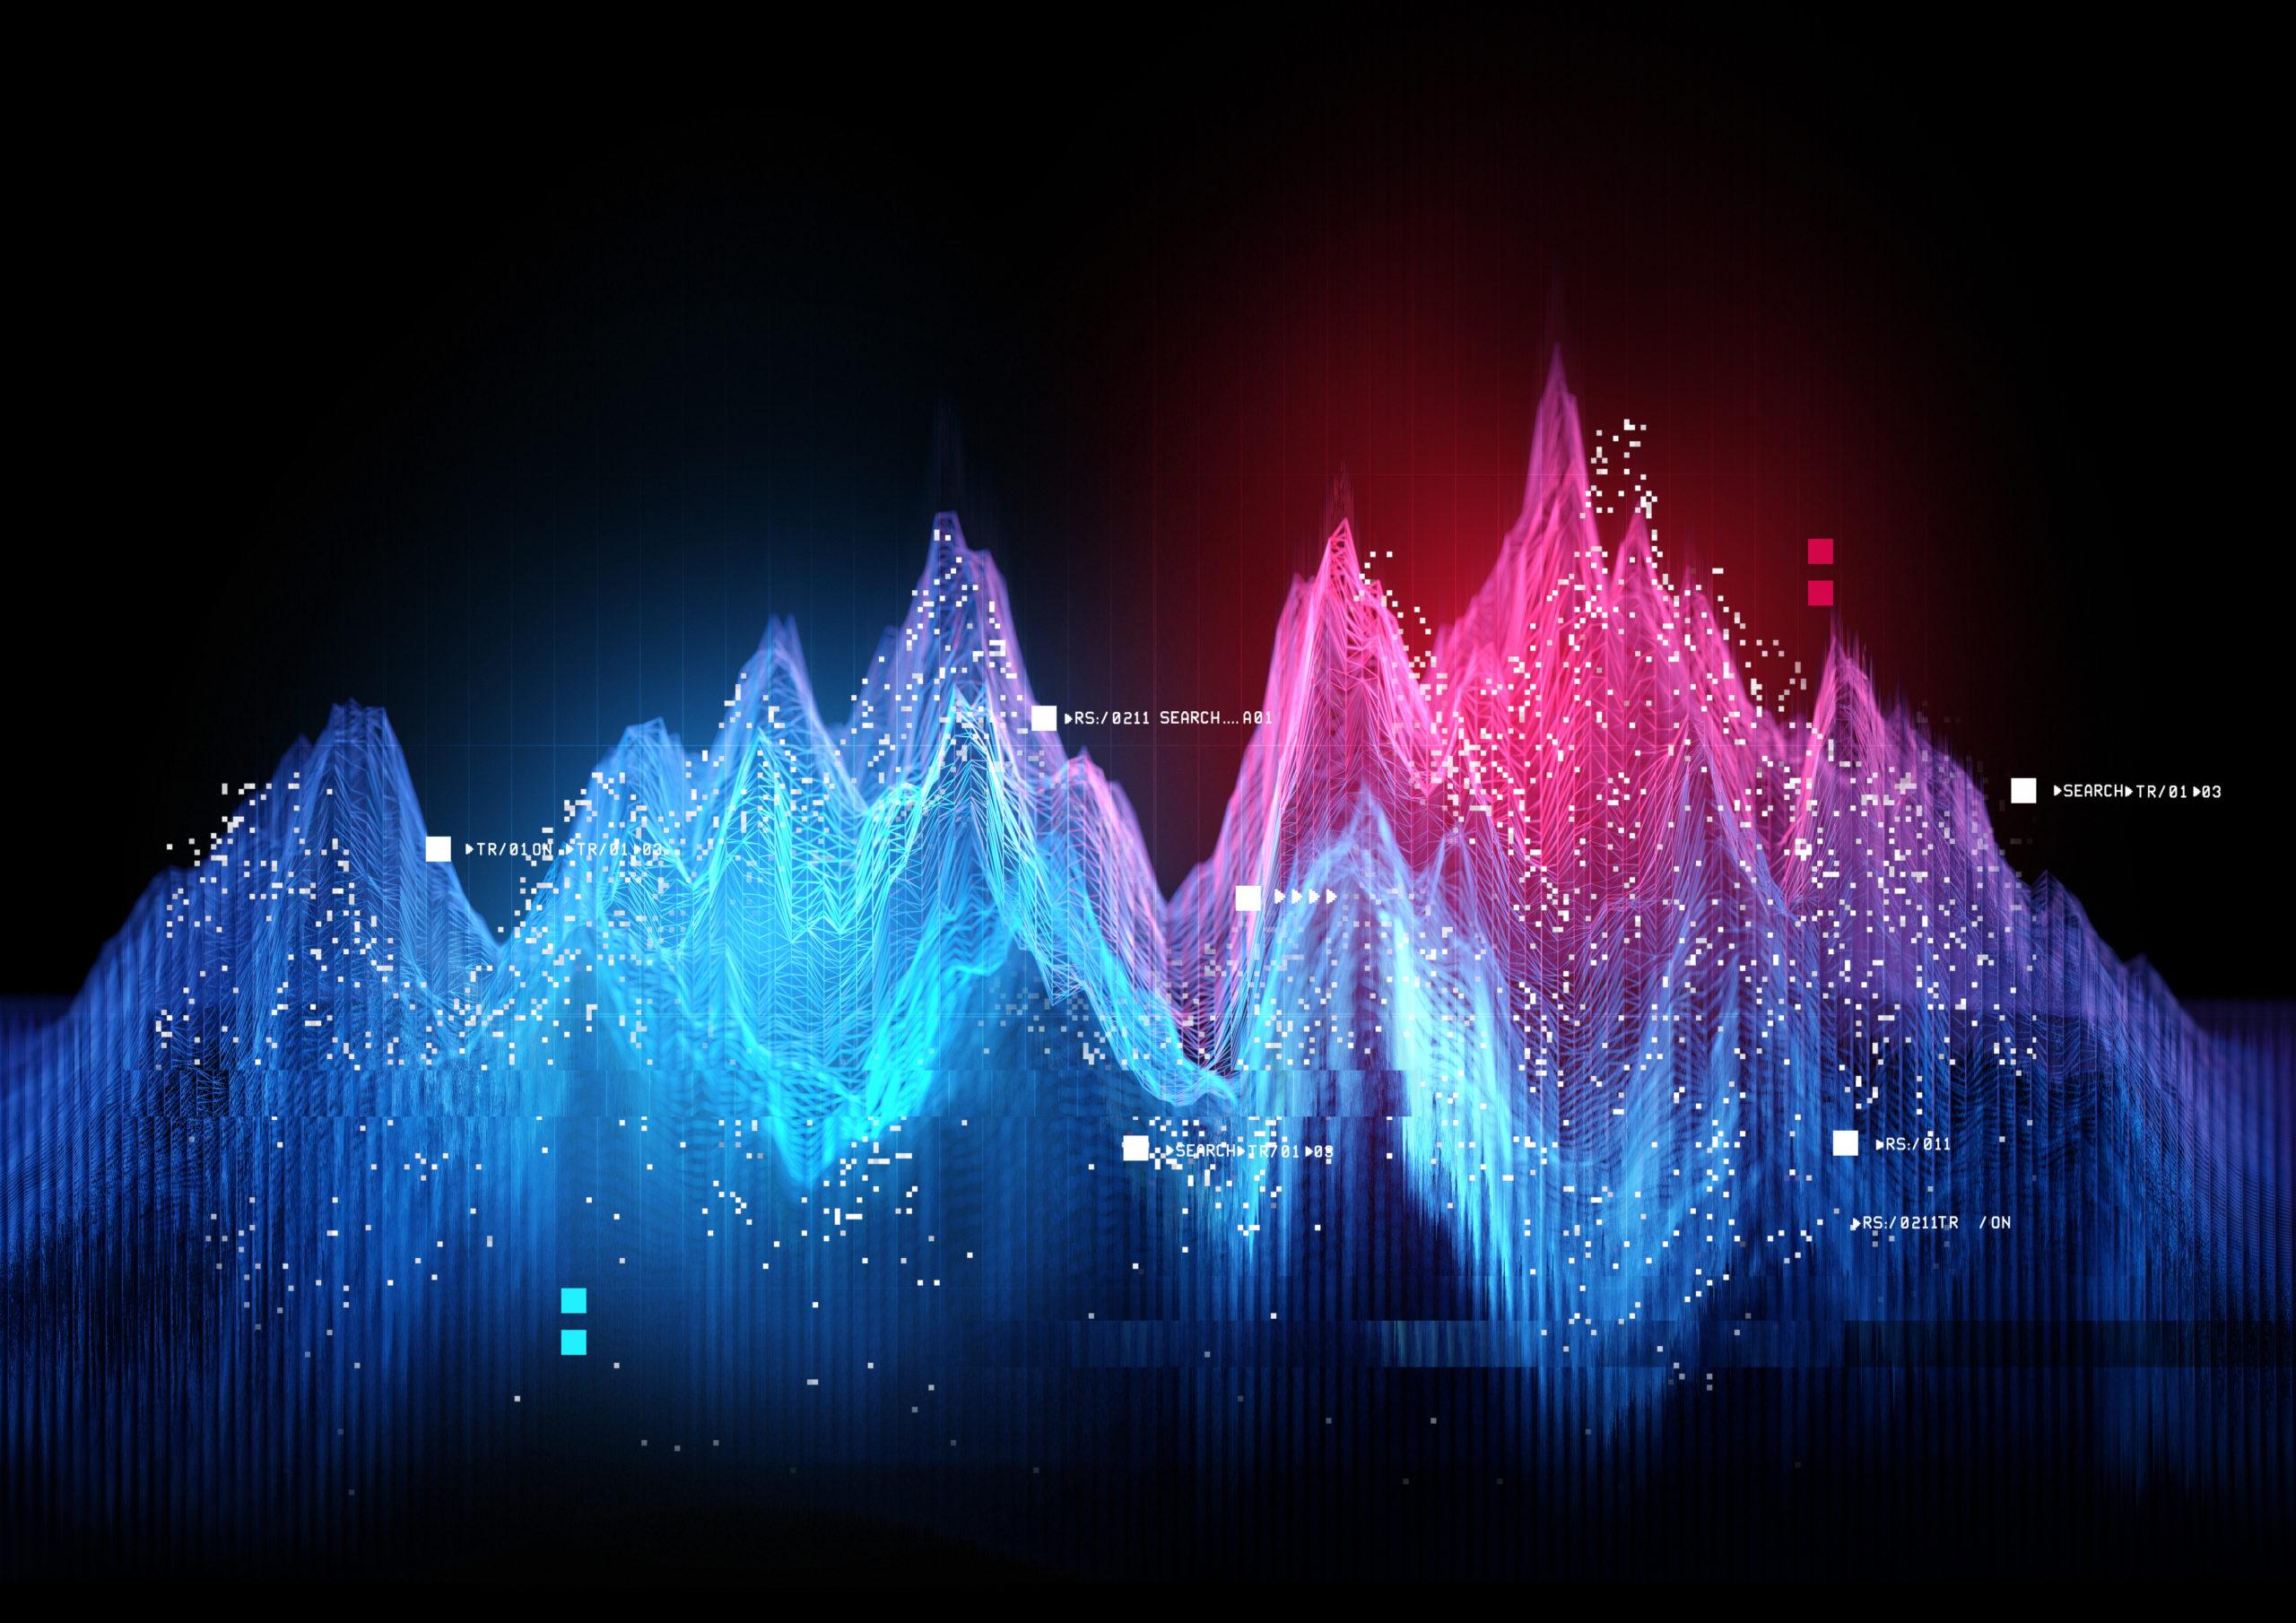 Tracking Statistics Visualization